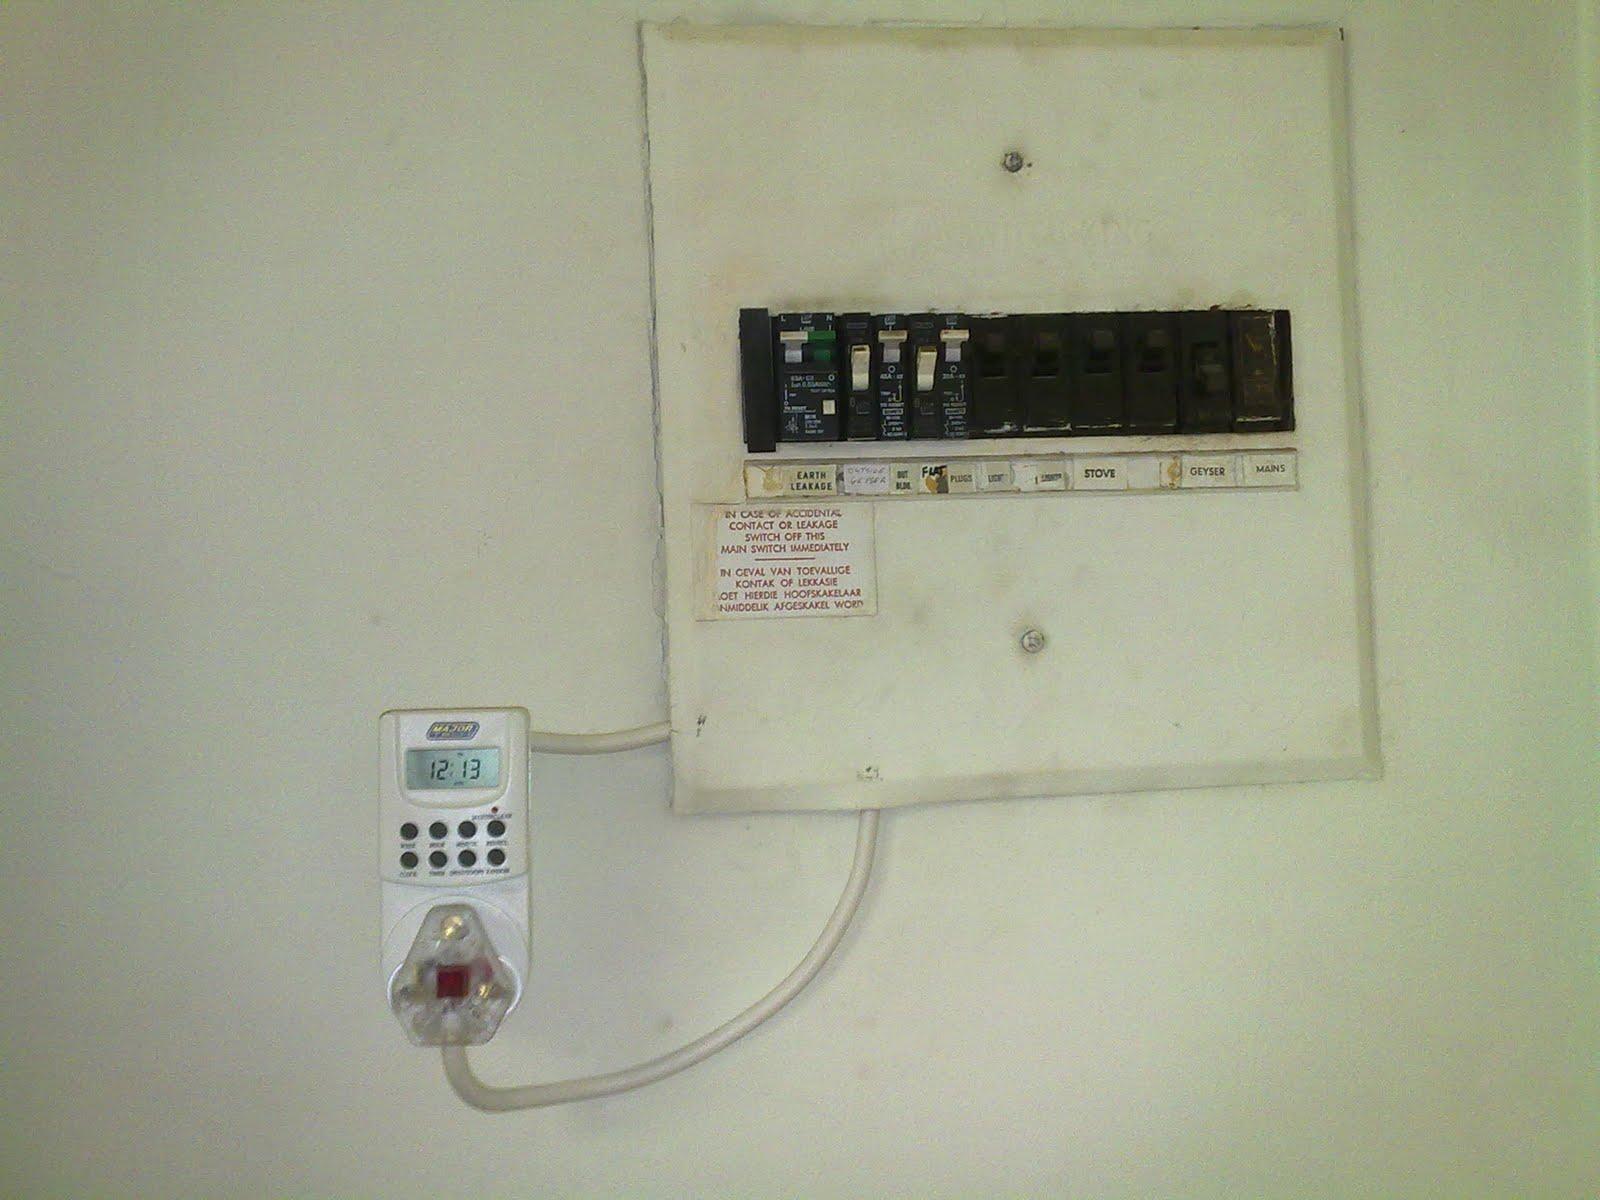 geyser timer wiring diagram rotork iq35 buju 39s blog innovations mods electronics guides